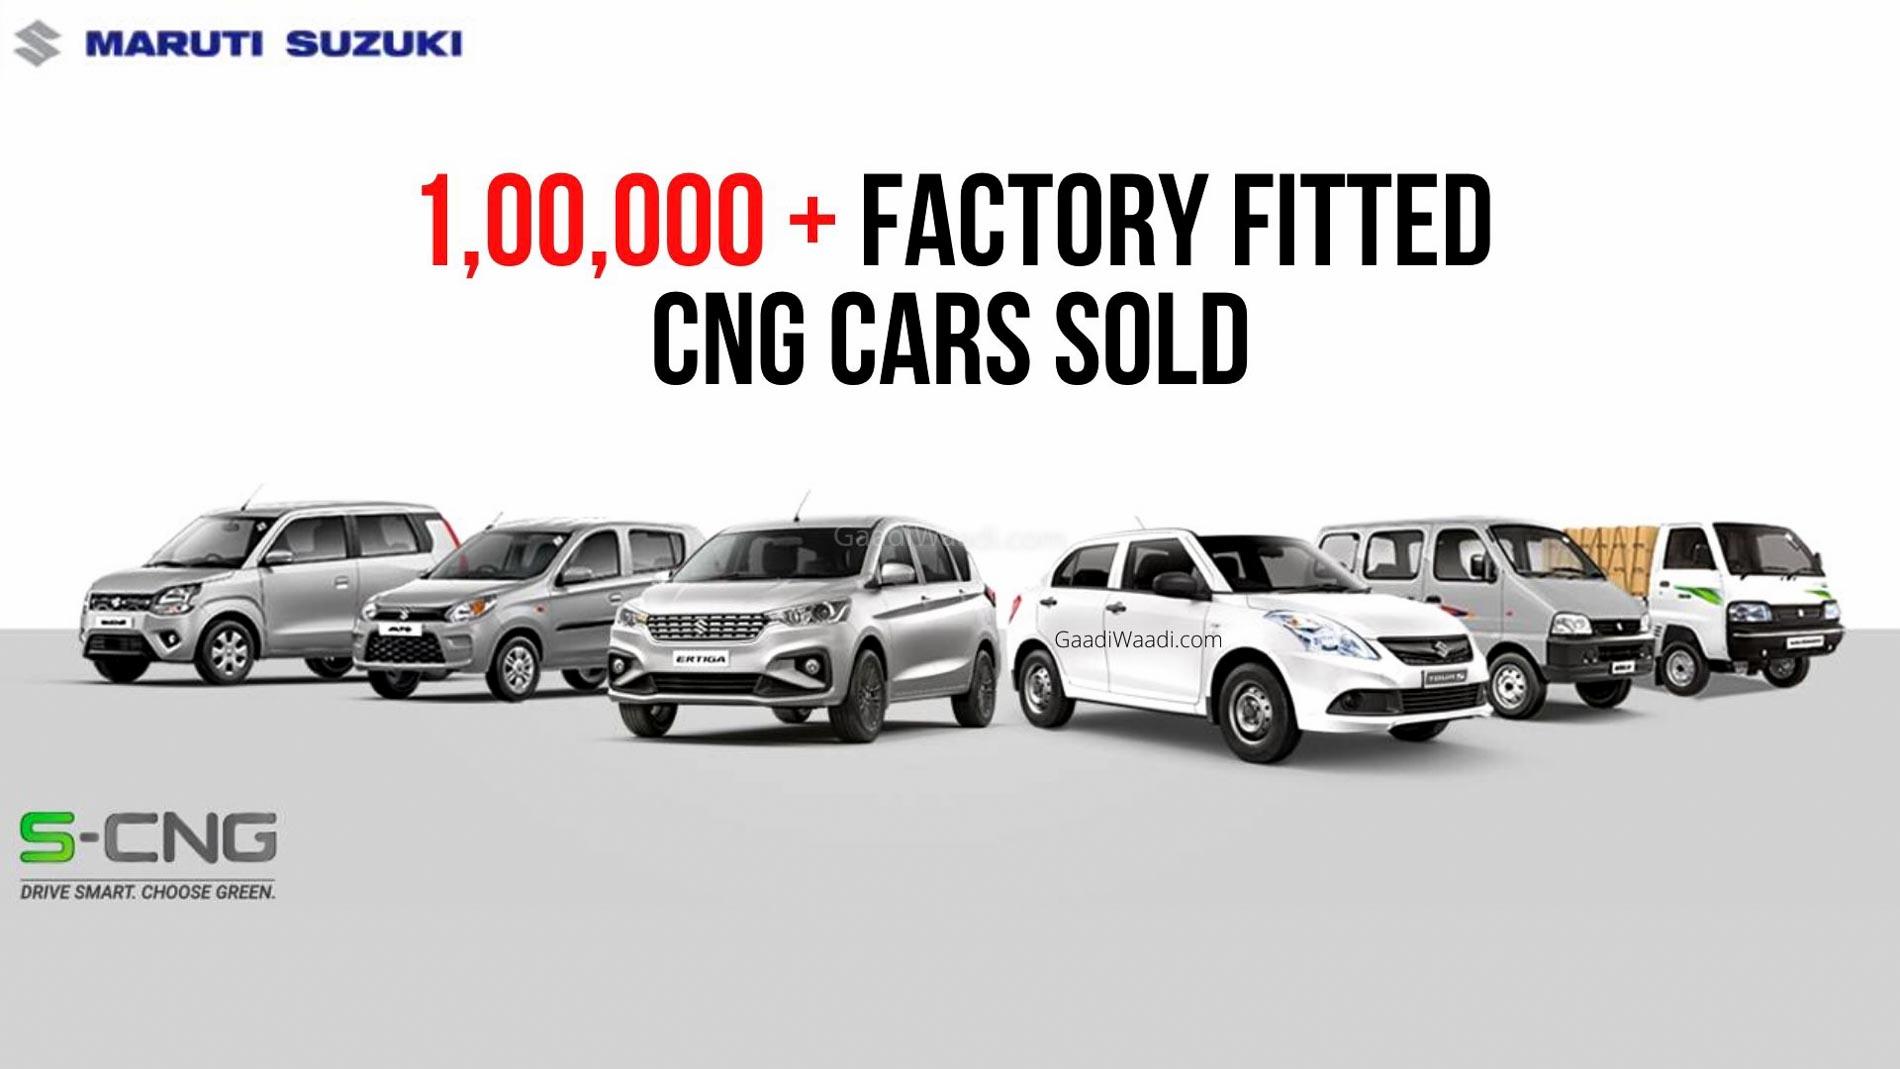 Maruti Suzuki S-CNG Car Sales Cross 1 Lakh Mark – Alto, Wagon R, Ertiga, Eeco